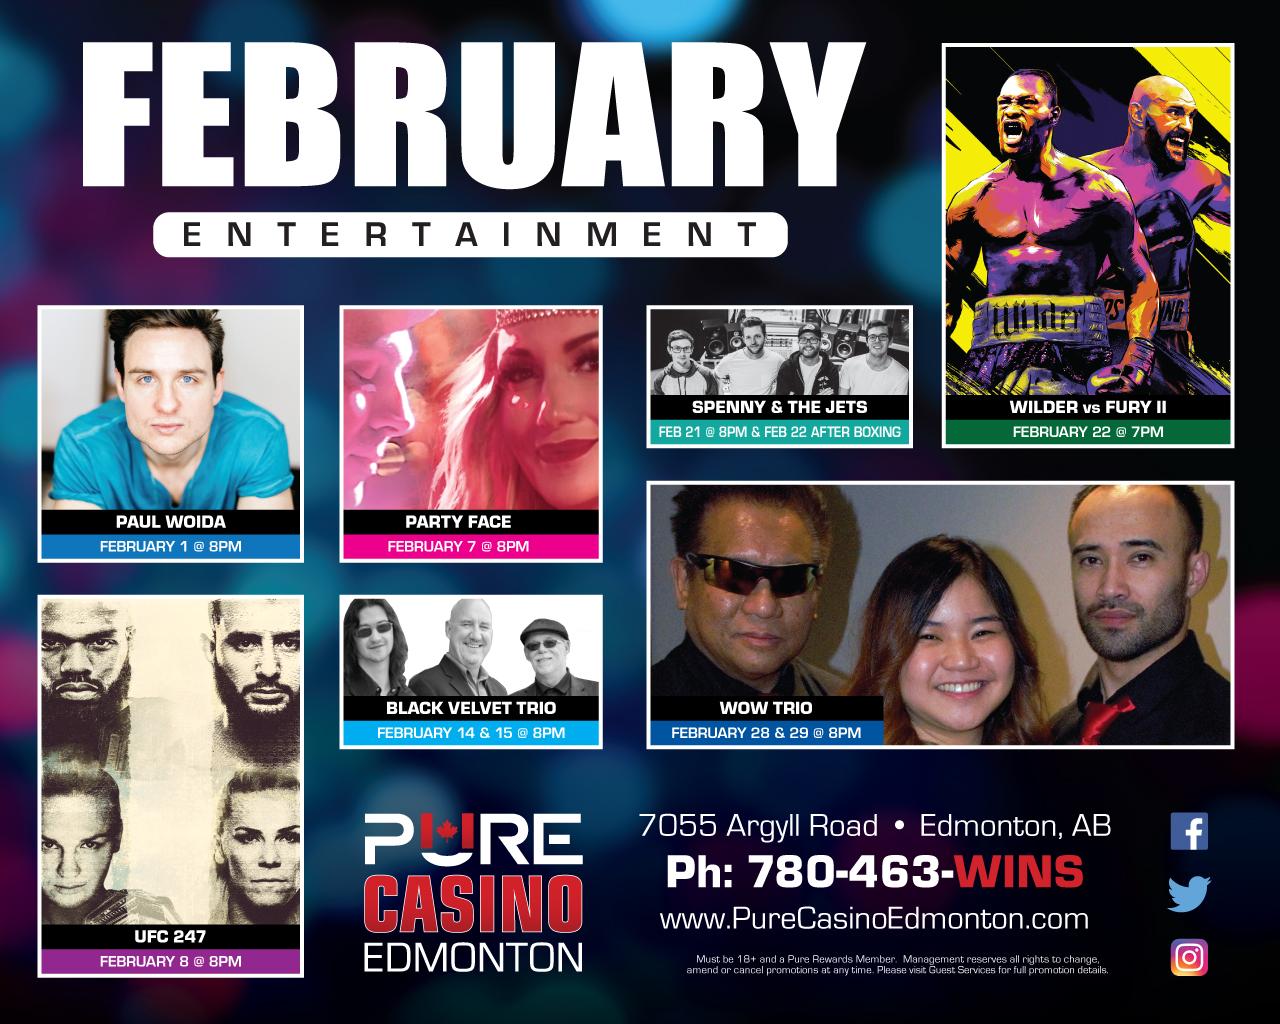 7055 Argyll Road Edmonton